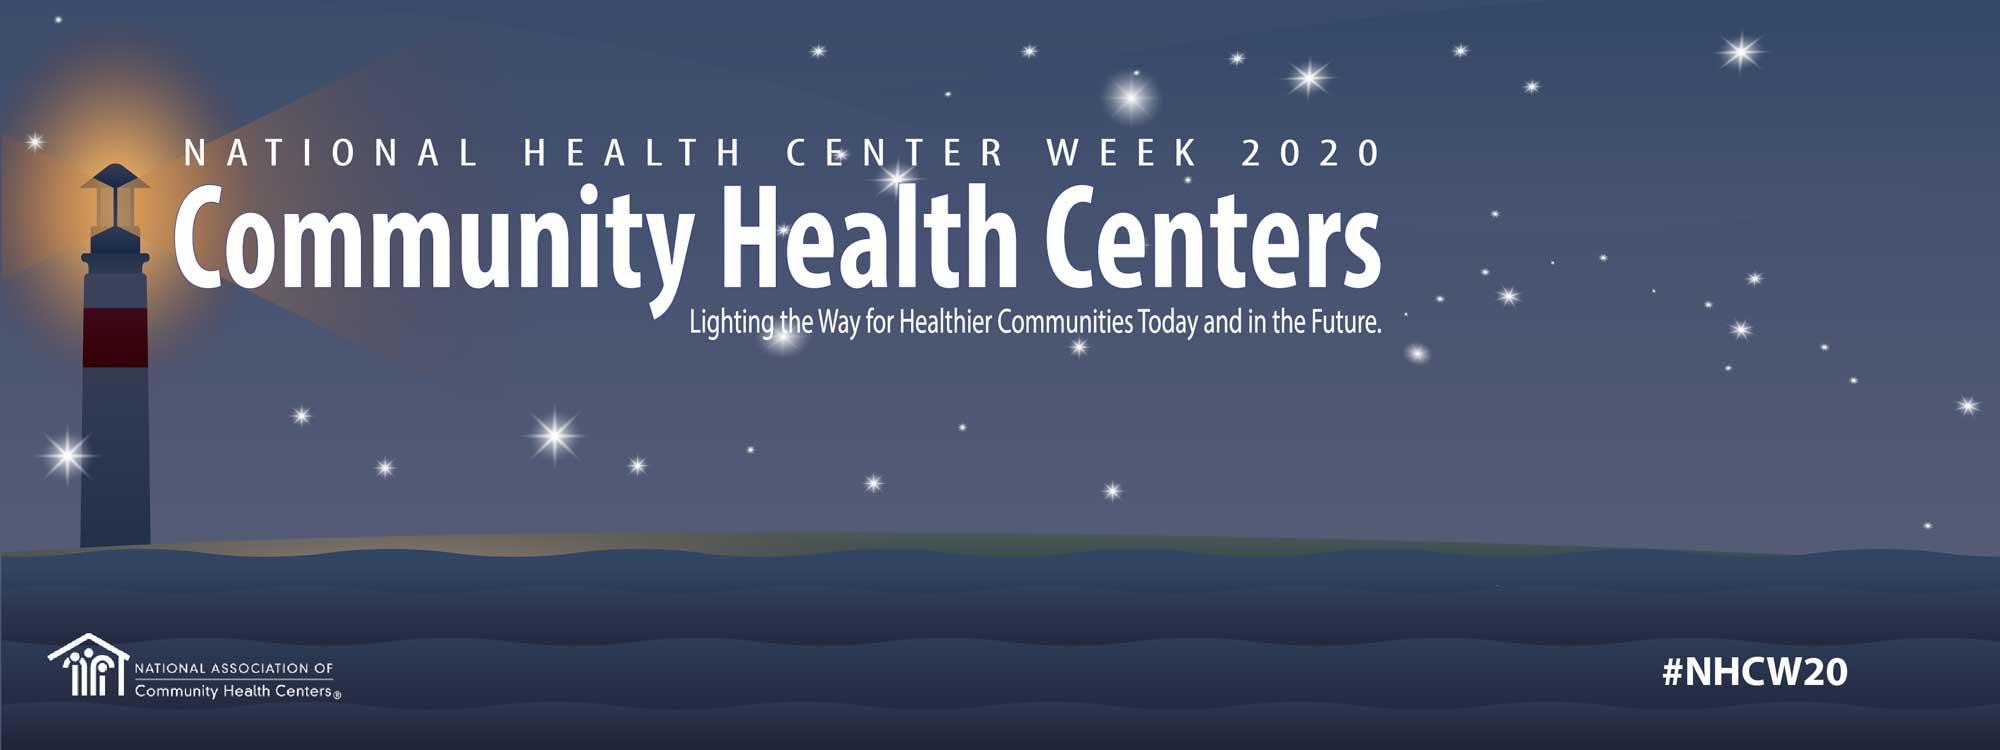 National Health Center week header